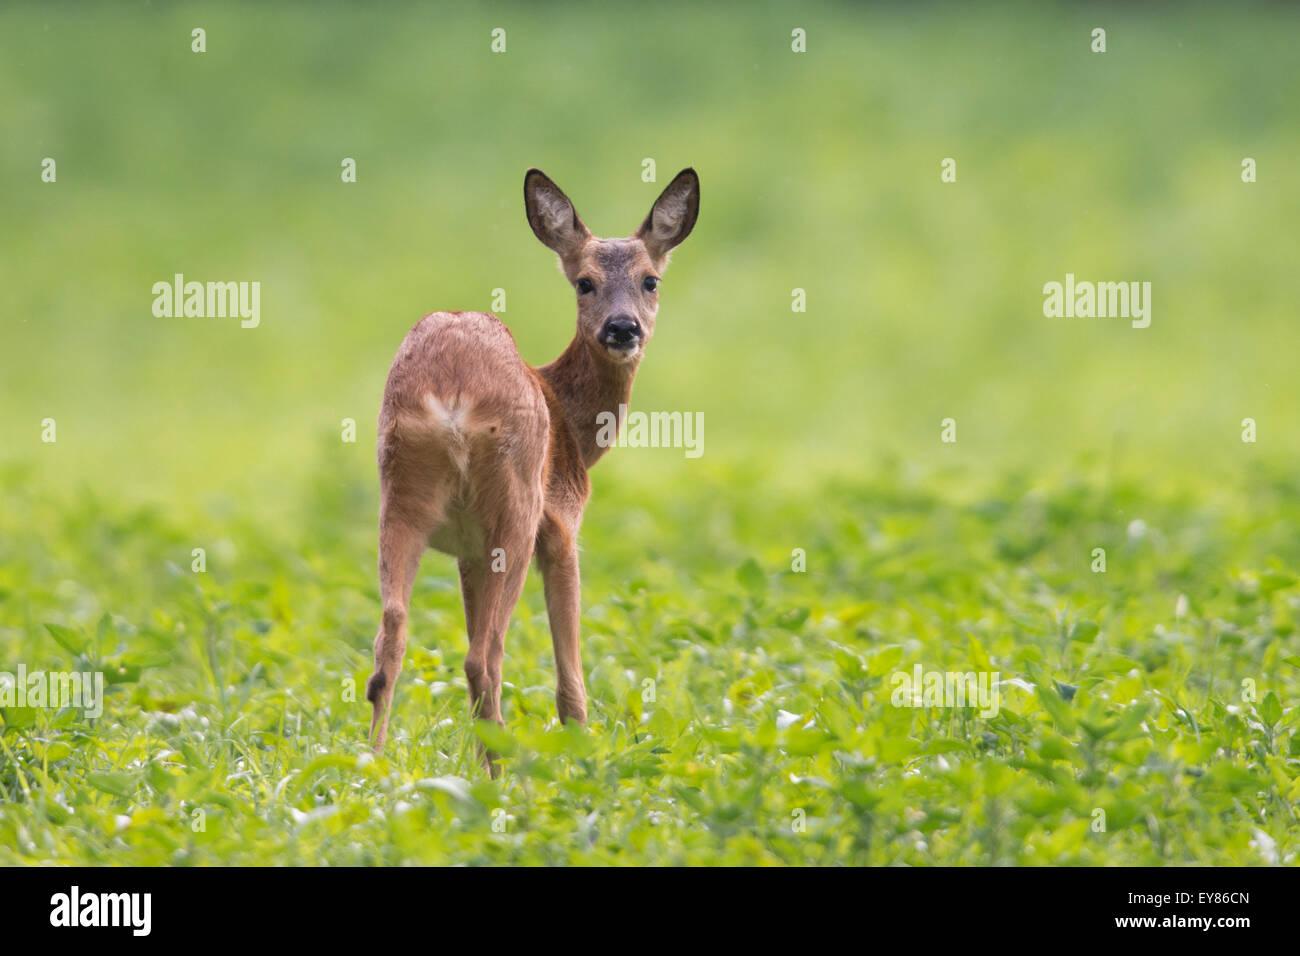 Roe Deer (Capreolus capreolus) standing in green field, Emsland, Lower Saxony, Germany - Stock Image